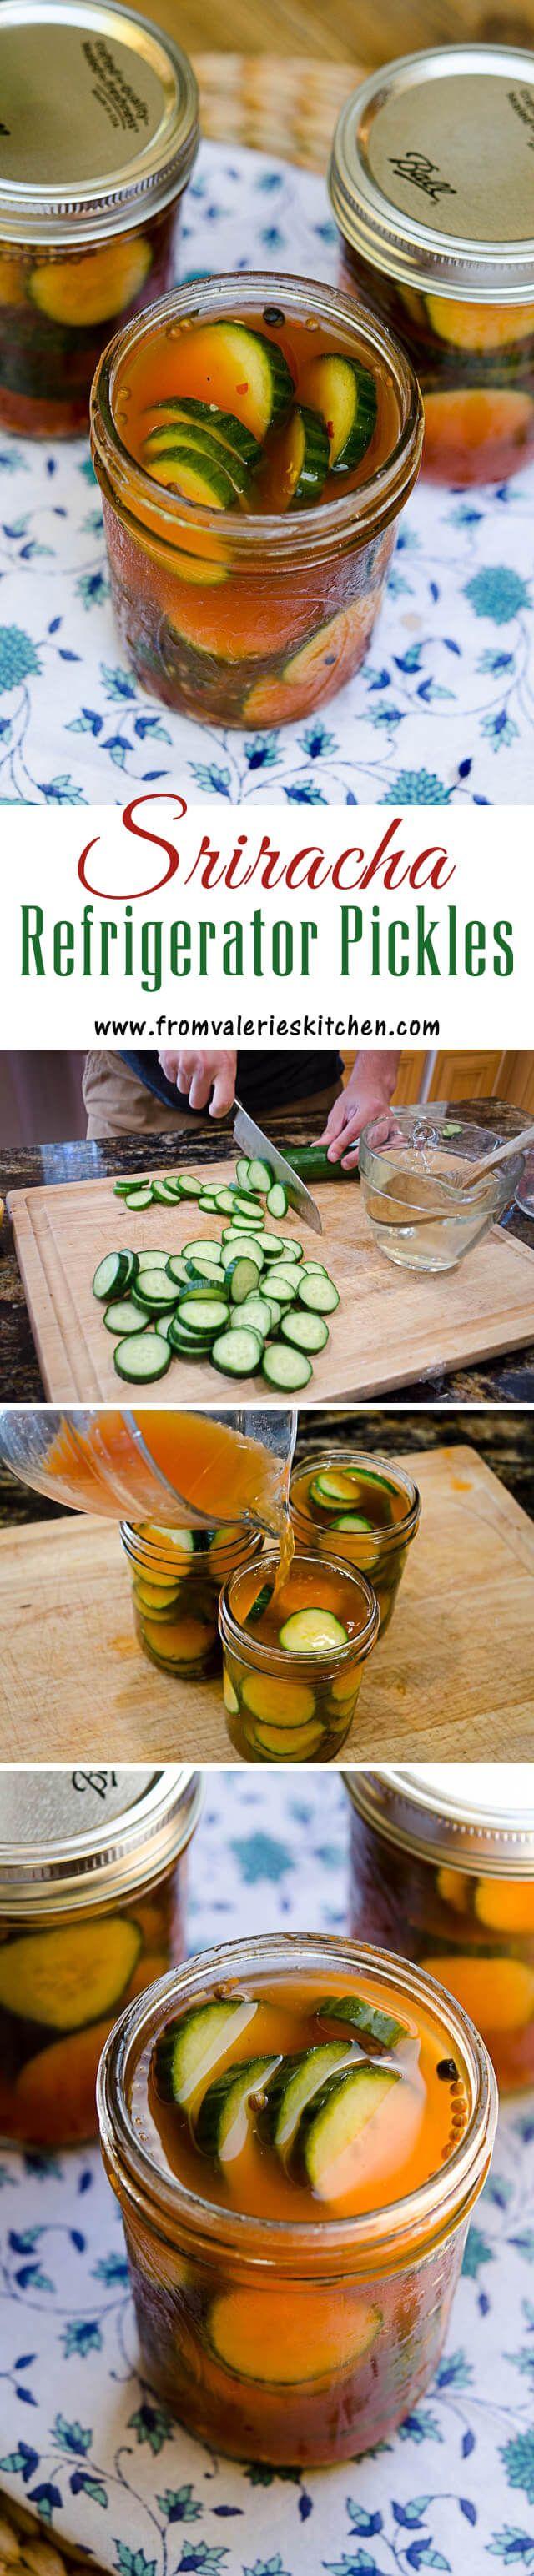 Sriracha Refrigerator Pickles | Recipe | Refrigerator Pickles ...